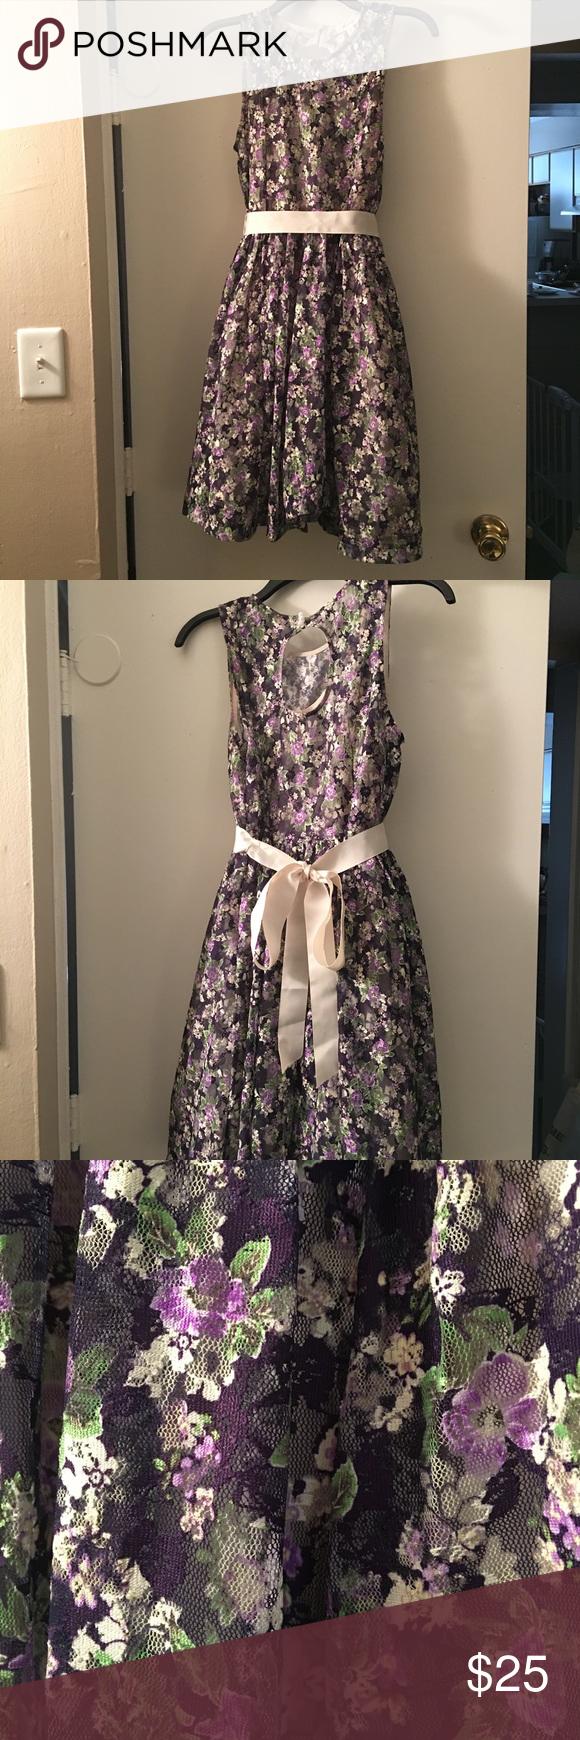 Modcloth Pre Walmart Dress Brand Freeway Never Worn Purple Flowered Lace Dress With White Ribbon Side Zip Mod Cloth Dresses Walmart Dresses Dress Brands [ 1740 x 580 Pixel ]